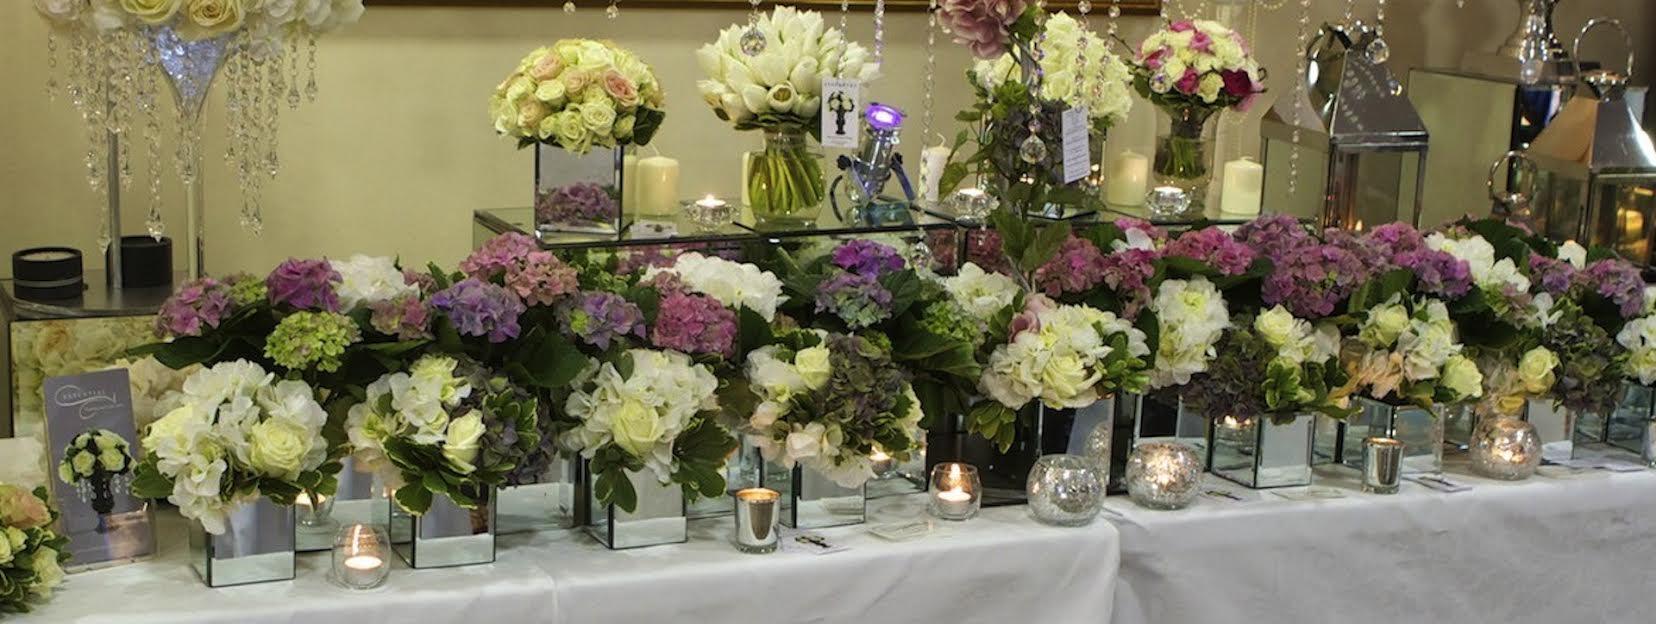 Luxury Wedding Show at The Luton Hoo Hotel, London. February 26th 2012.